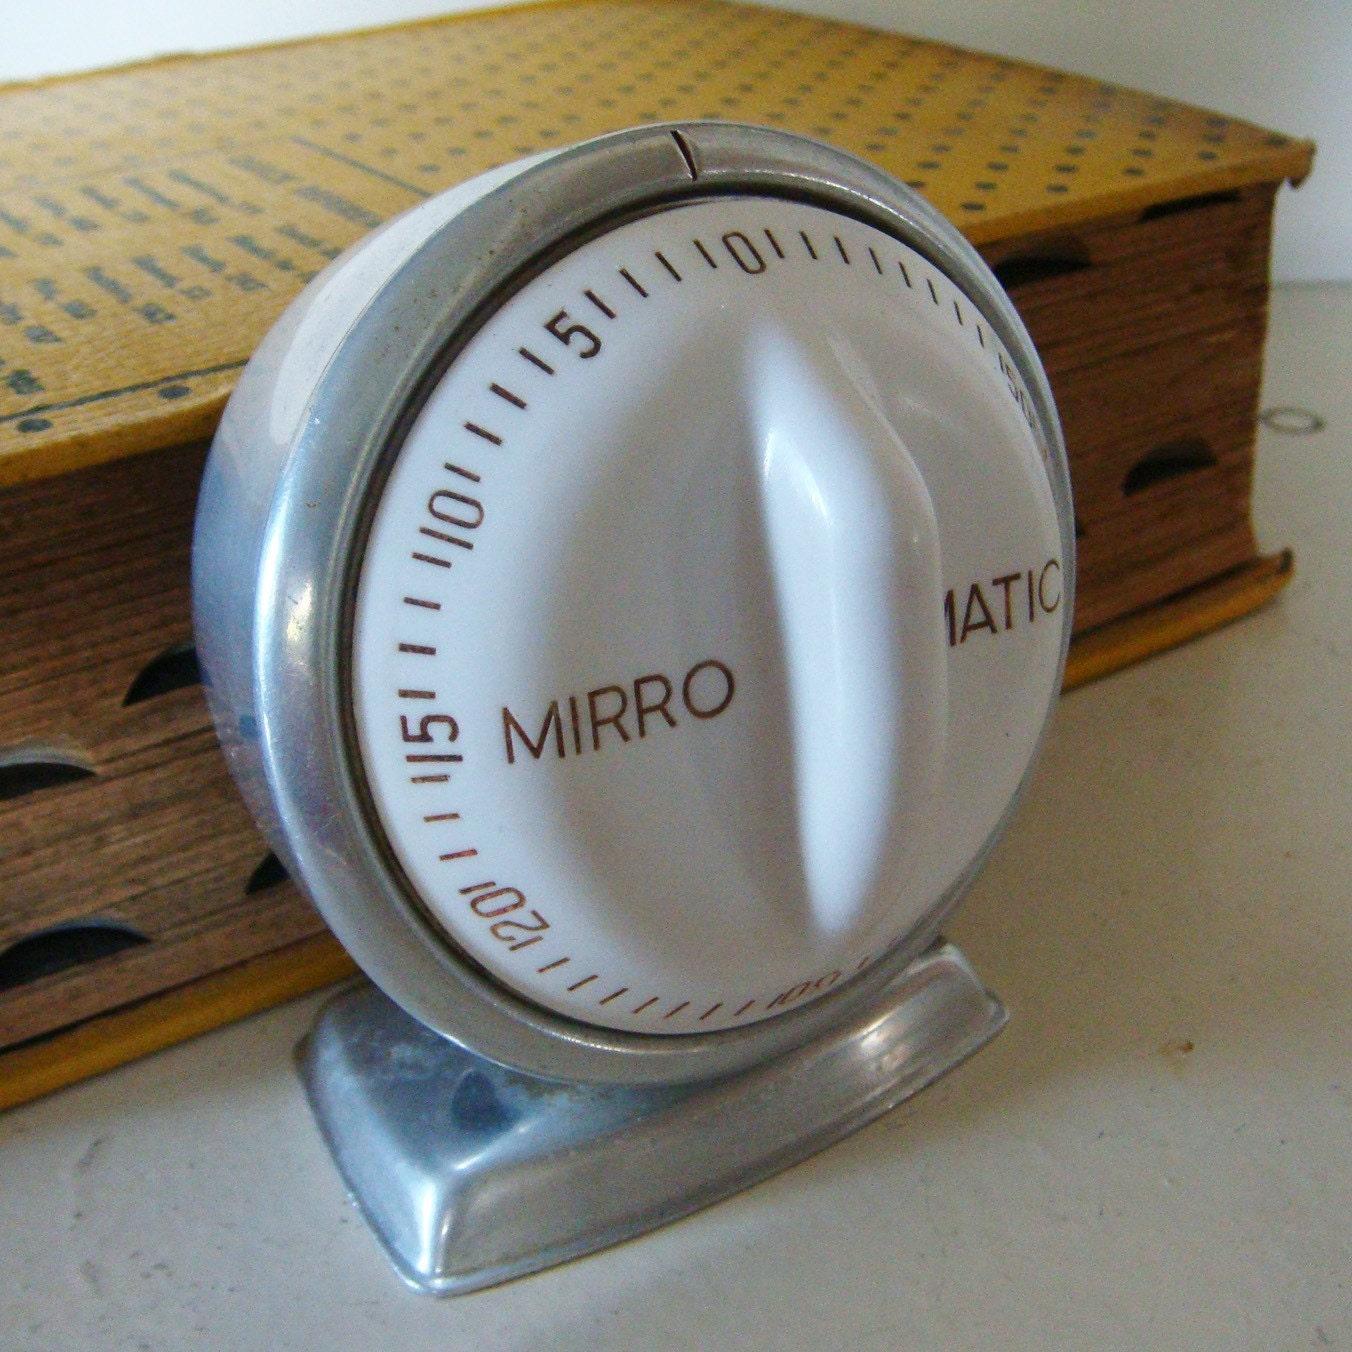 1950s Retro Kitchen Timer Mirro Matic Vintage